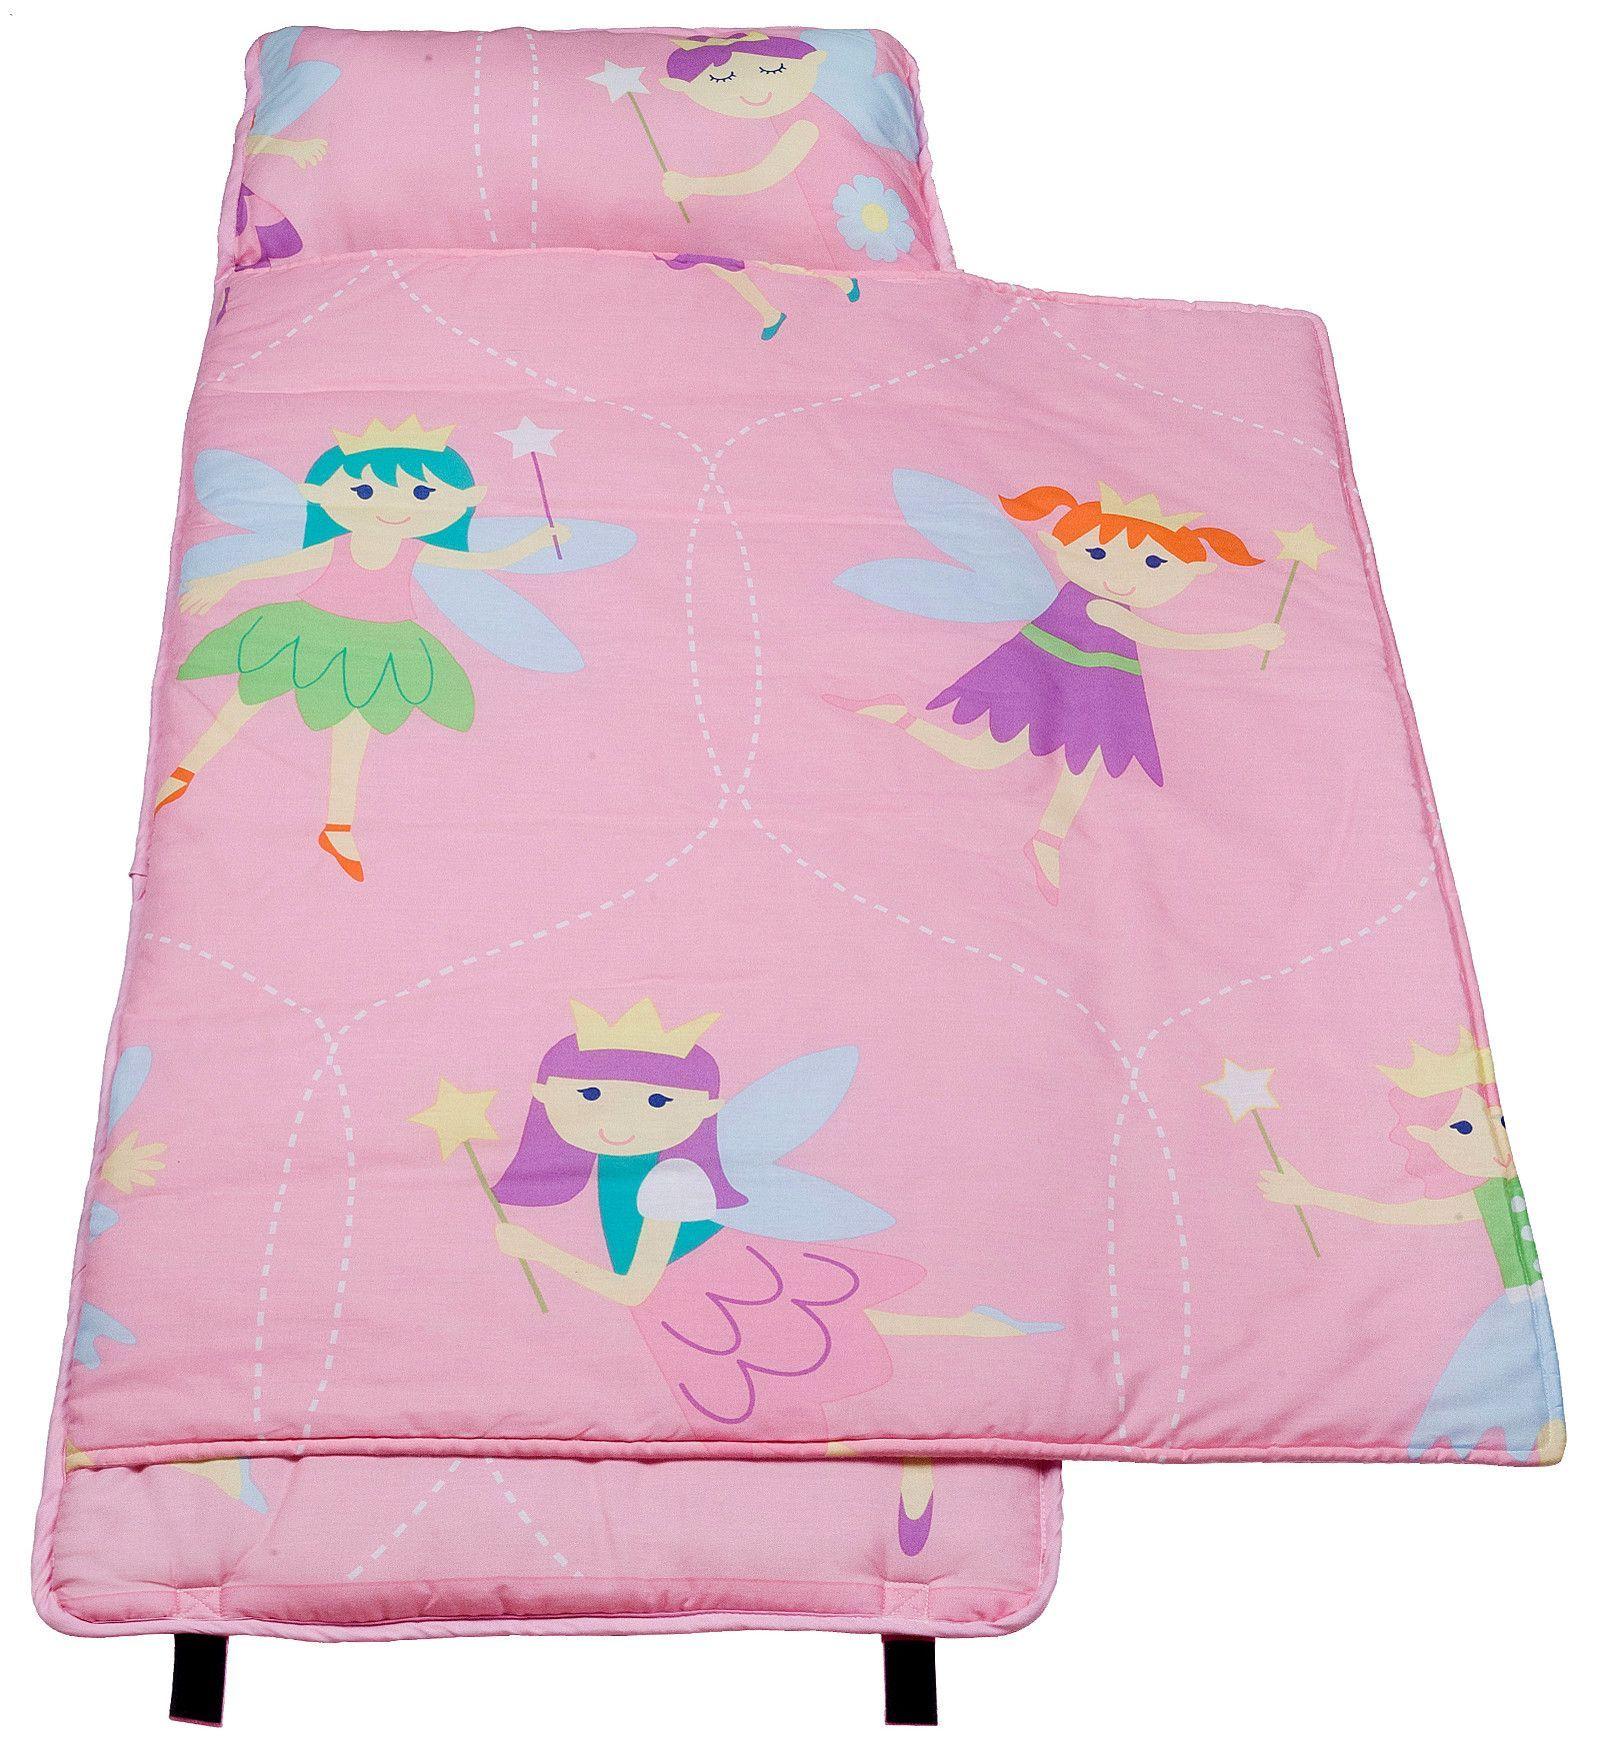 Wildkin Fairy Princess 100 Cotton Nap Mat Olive Kids Nap Mat Kids Nap Mats